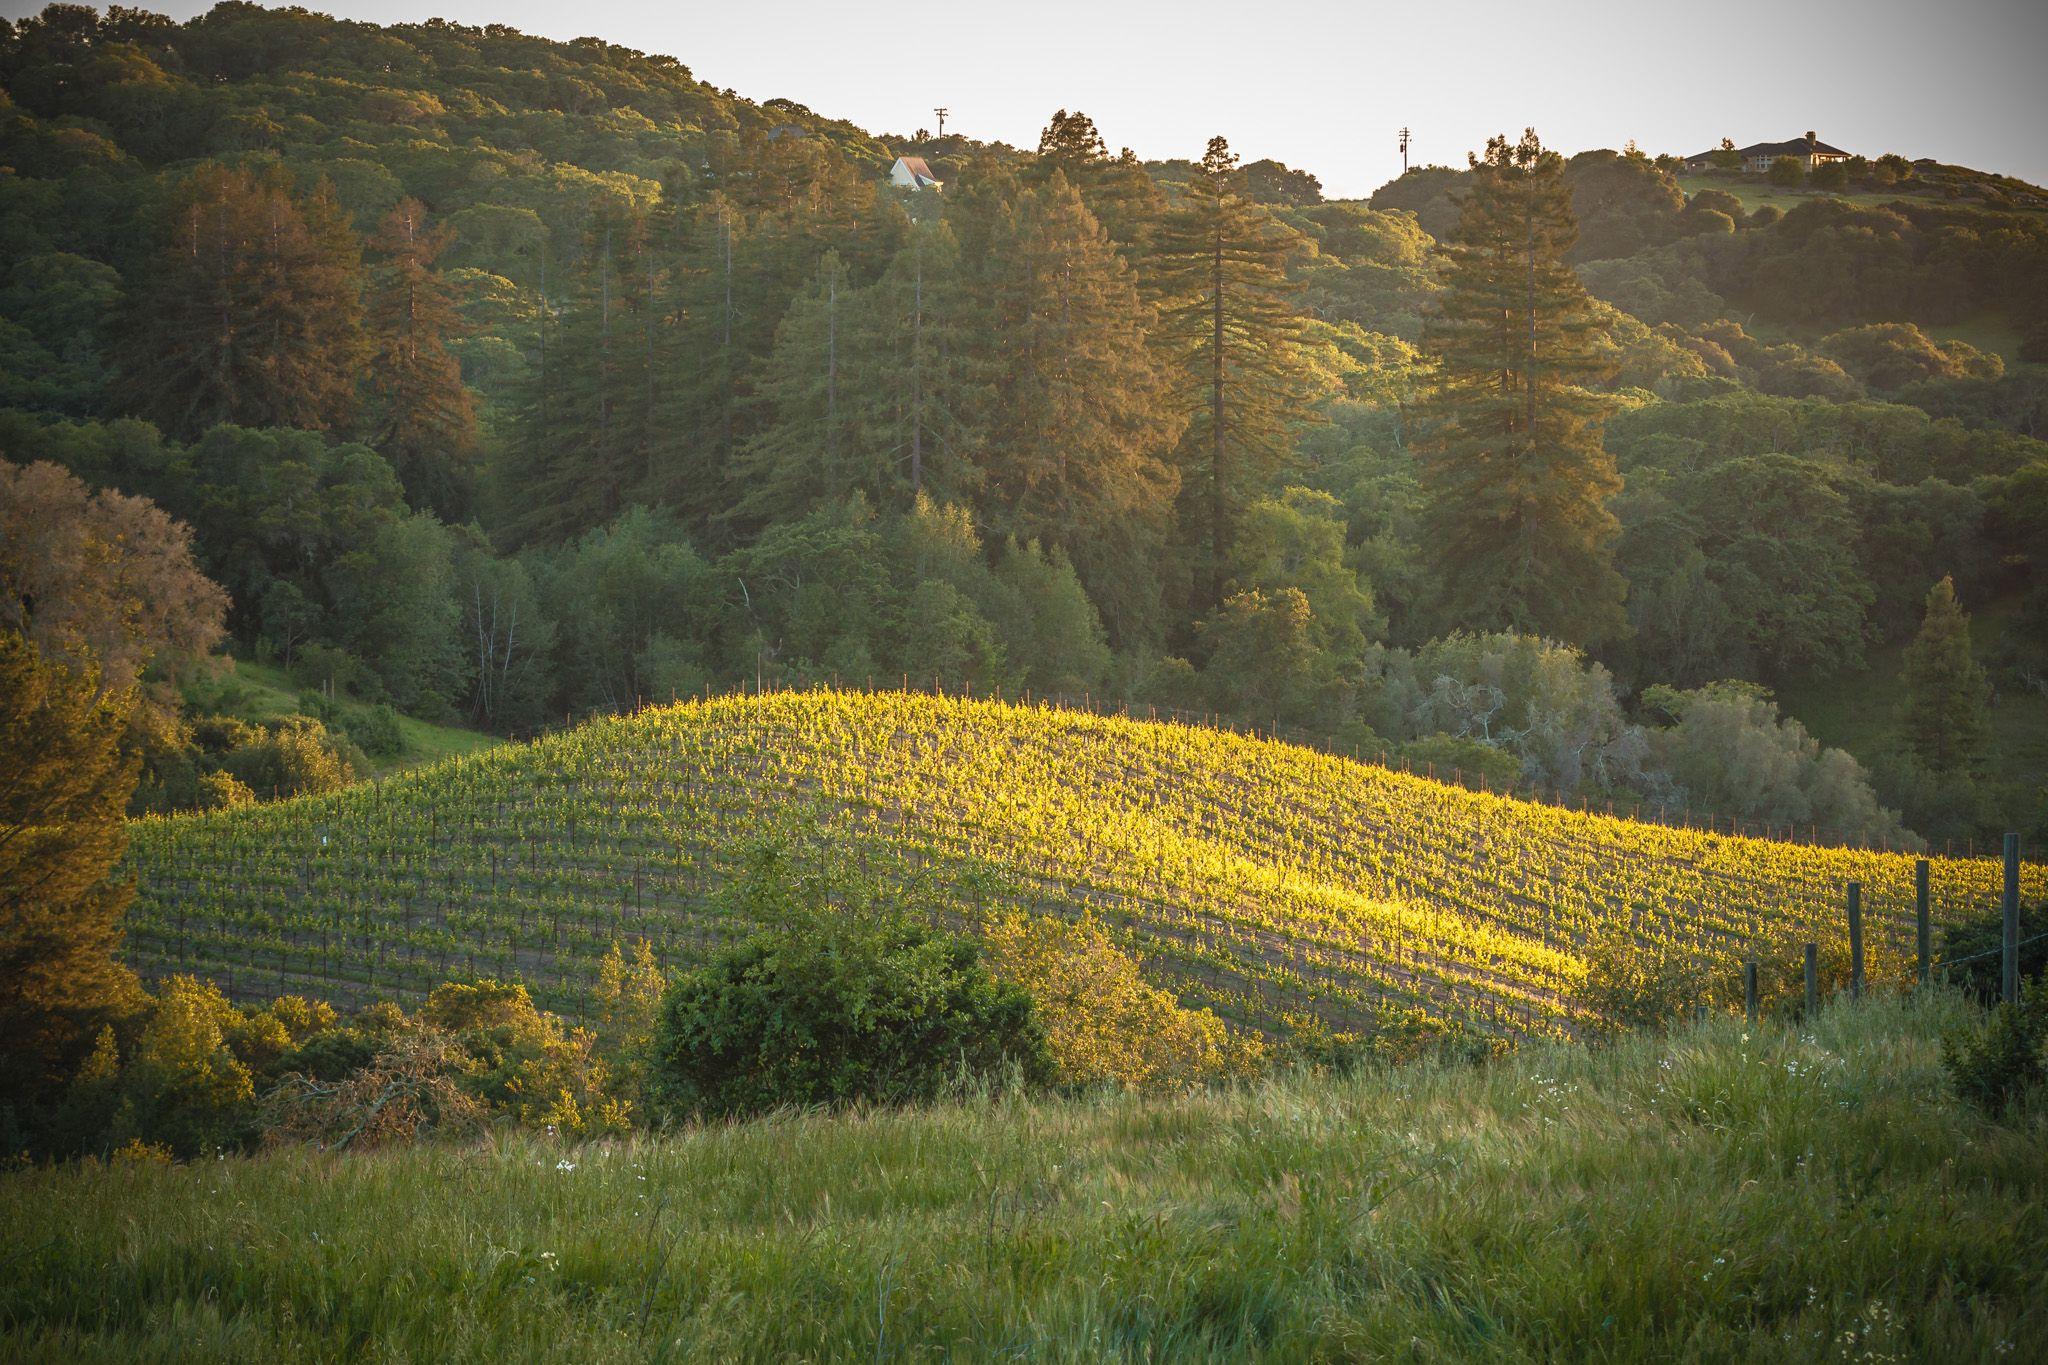 Vineyards - Wineroutes.com by Grapexchange.com